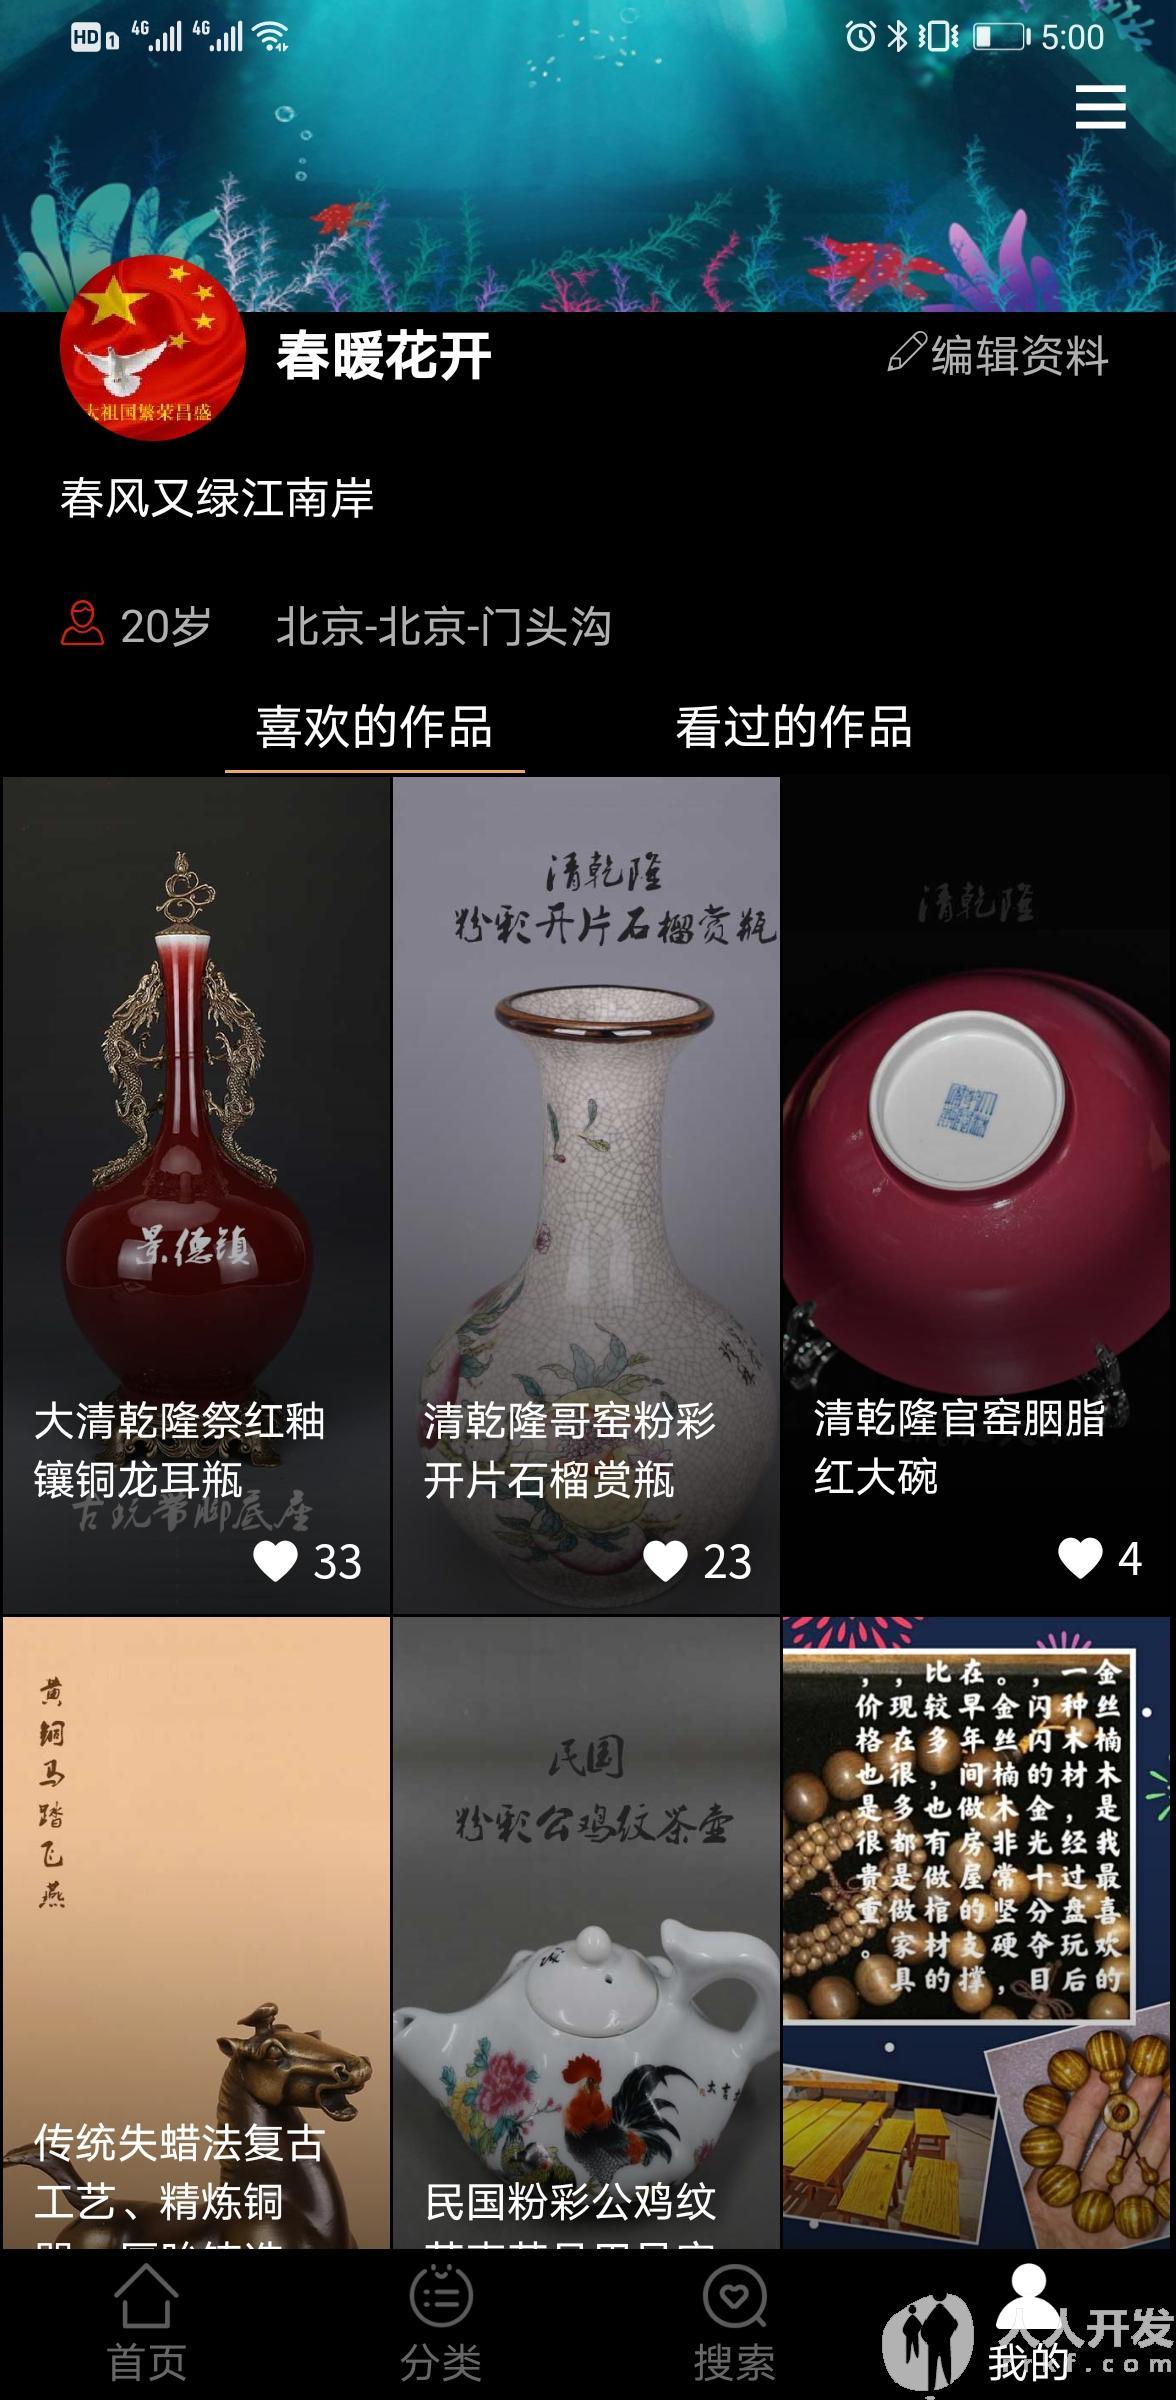 Screenshot_20210423_170009_com.yiyuanyoudao.app.jpg